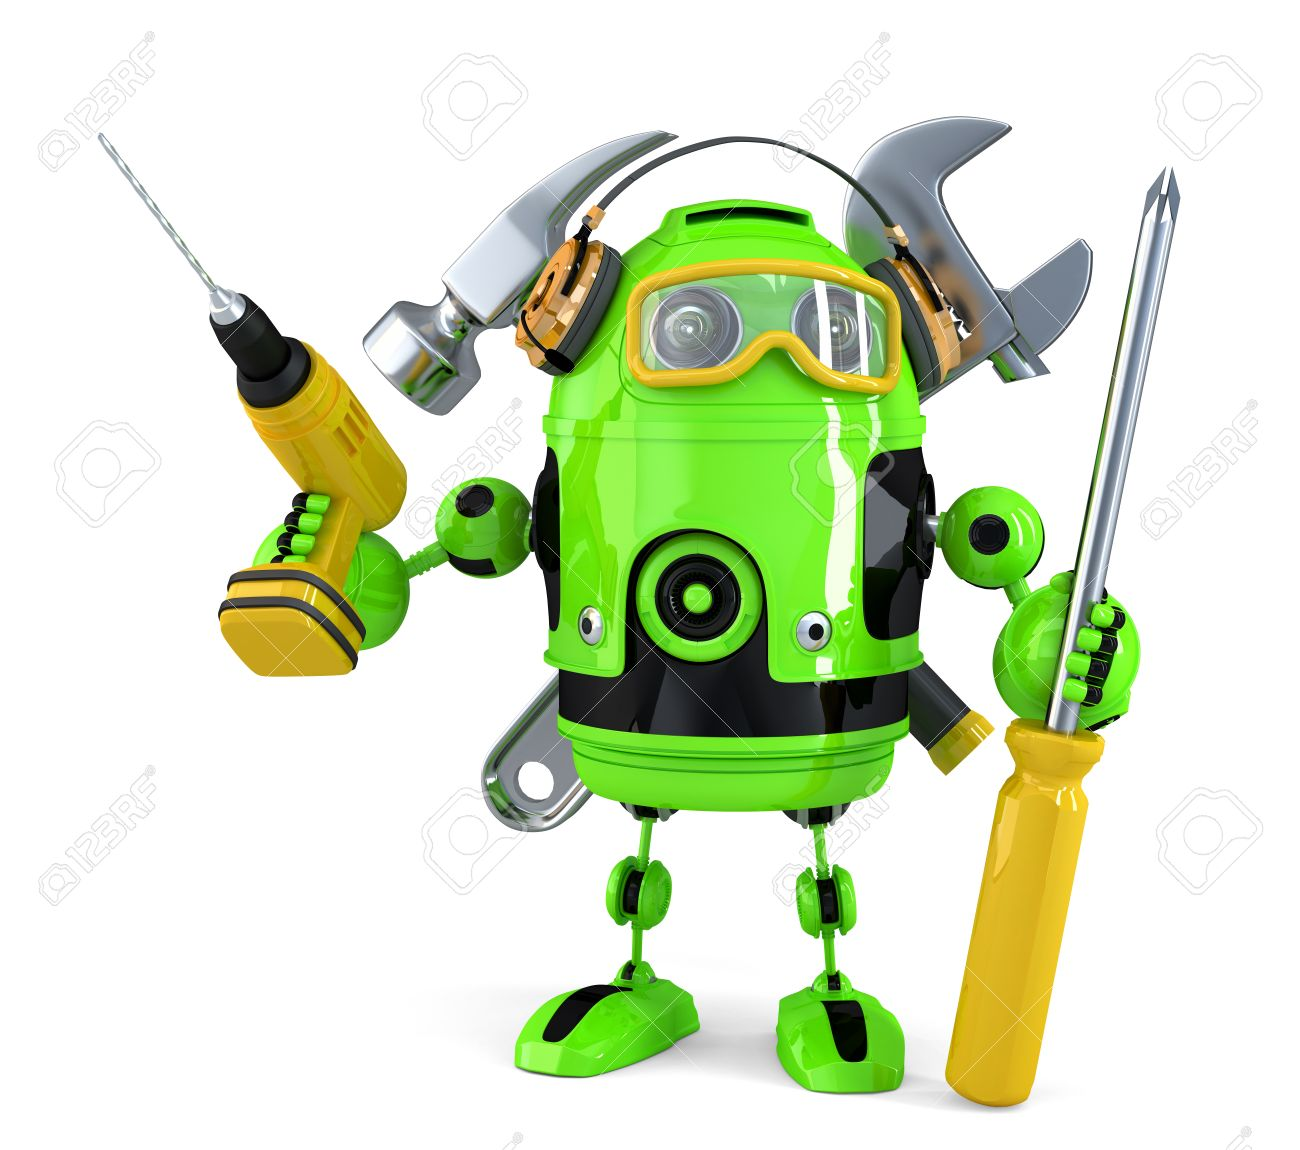 Construction robot. Technology concept.Isolated. Standard-Bild - 40577371